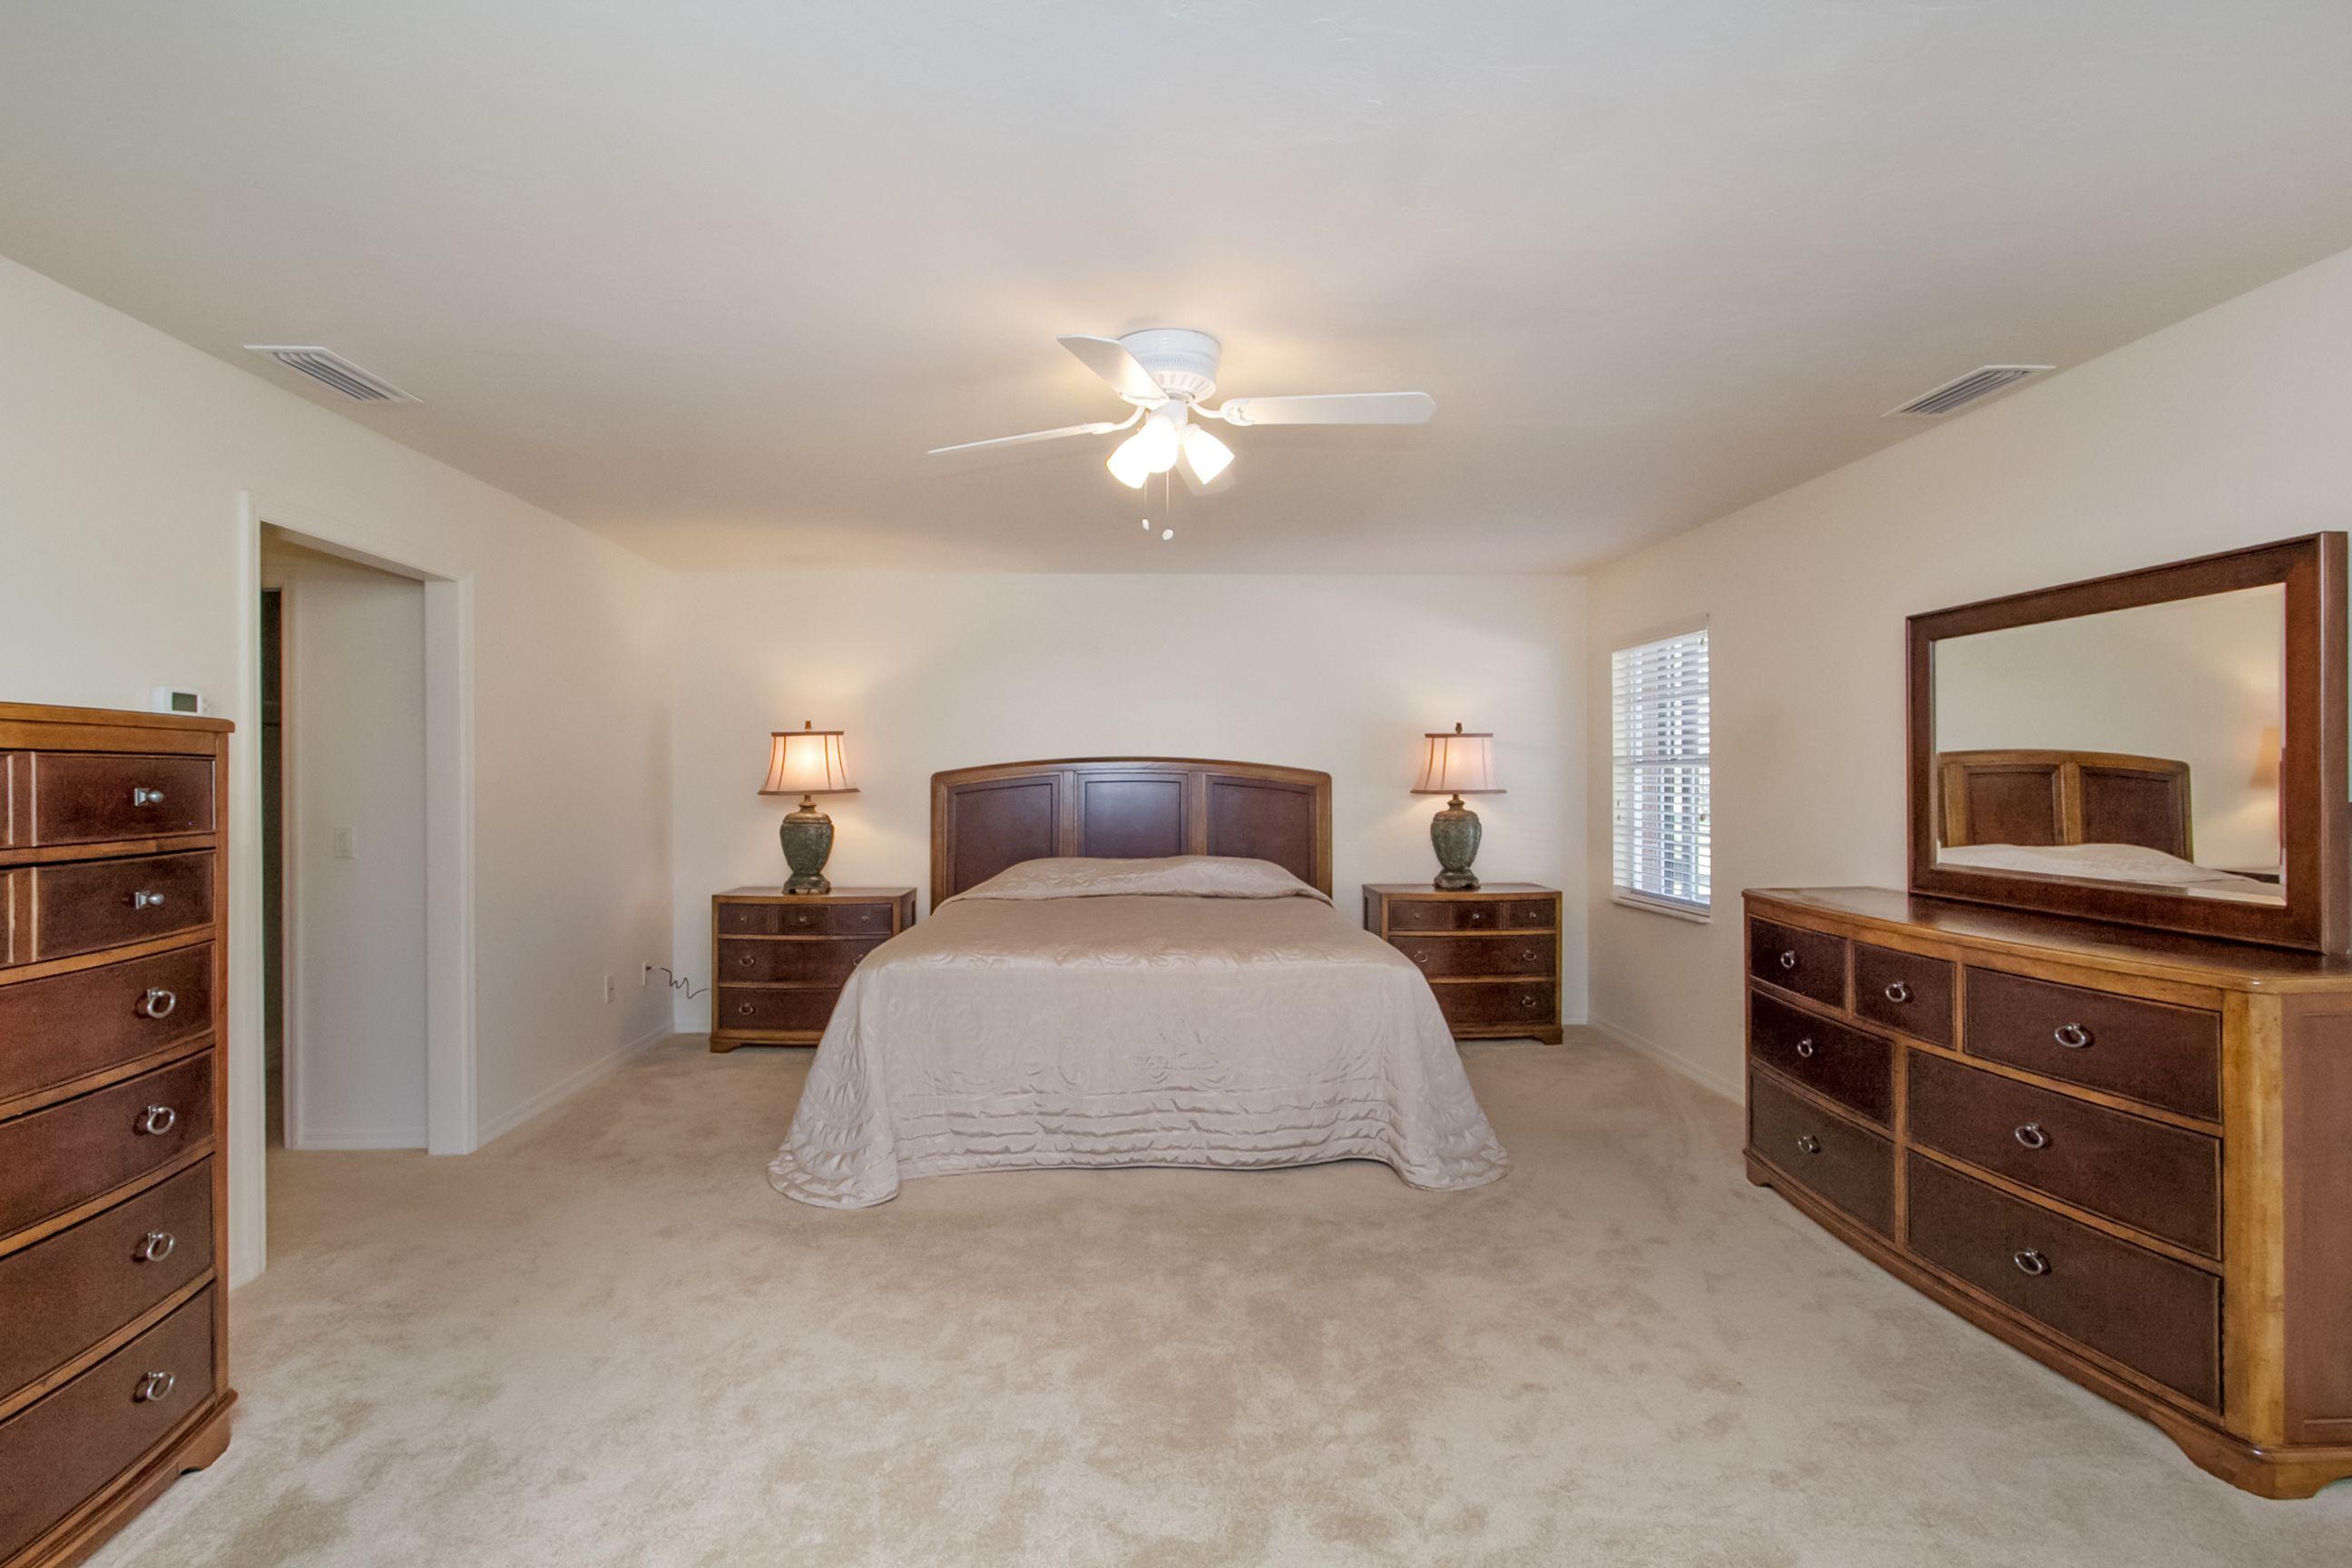 Master bedroom huge  Huge master bedroom easily accommodates a king bed and oversized